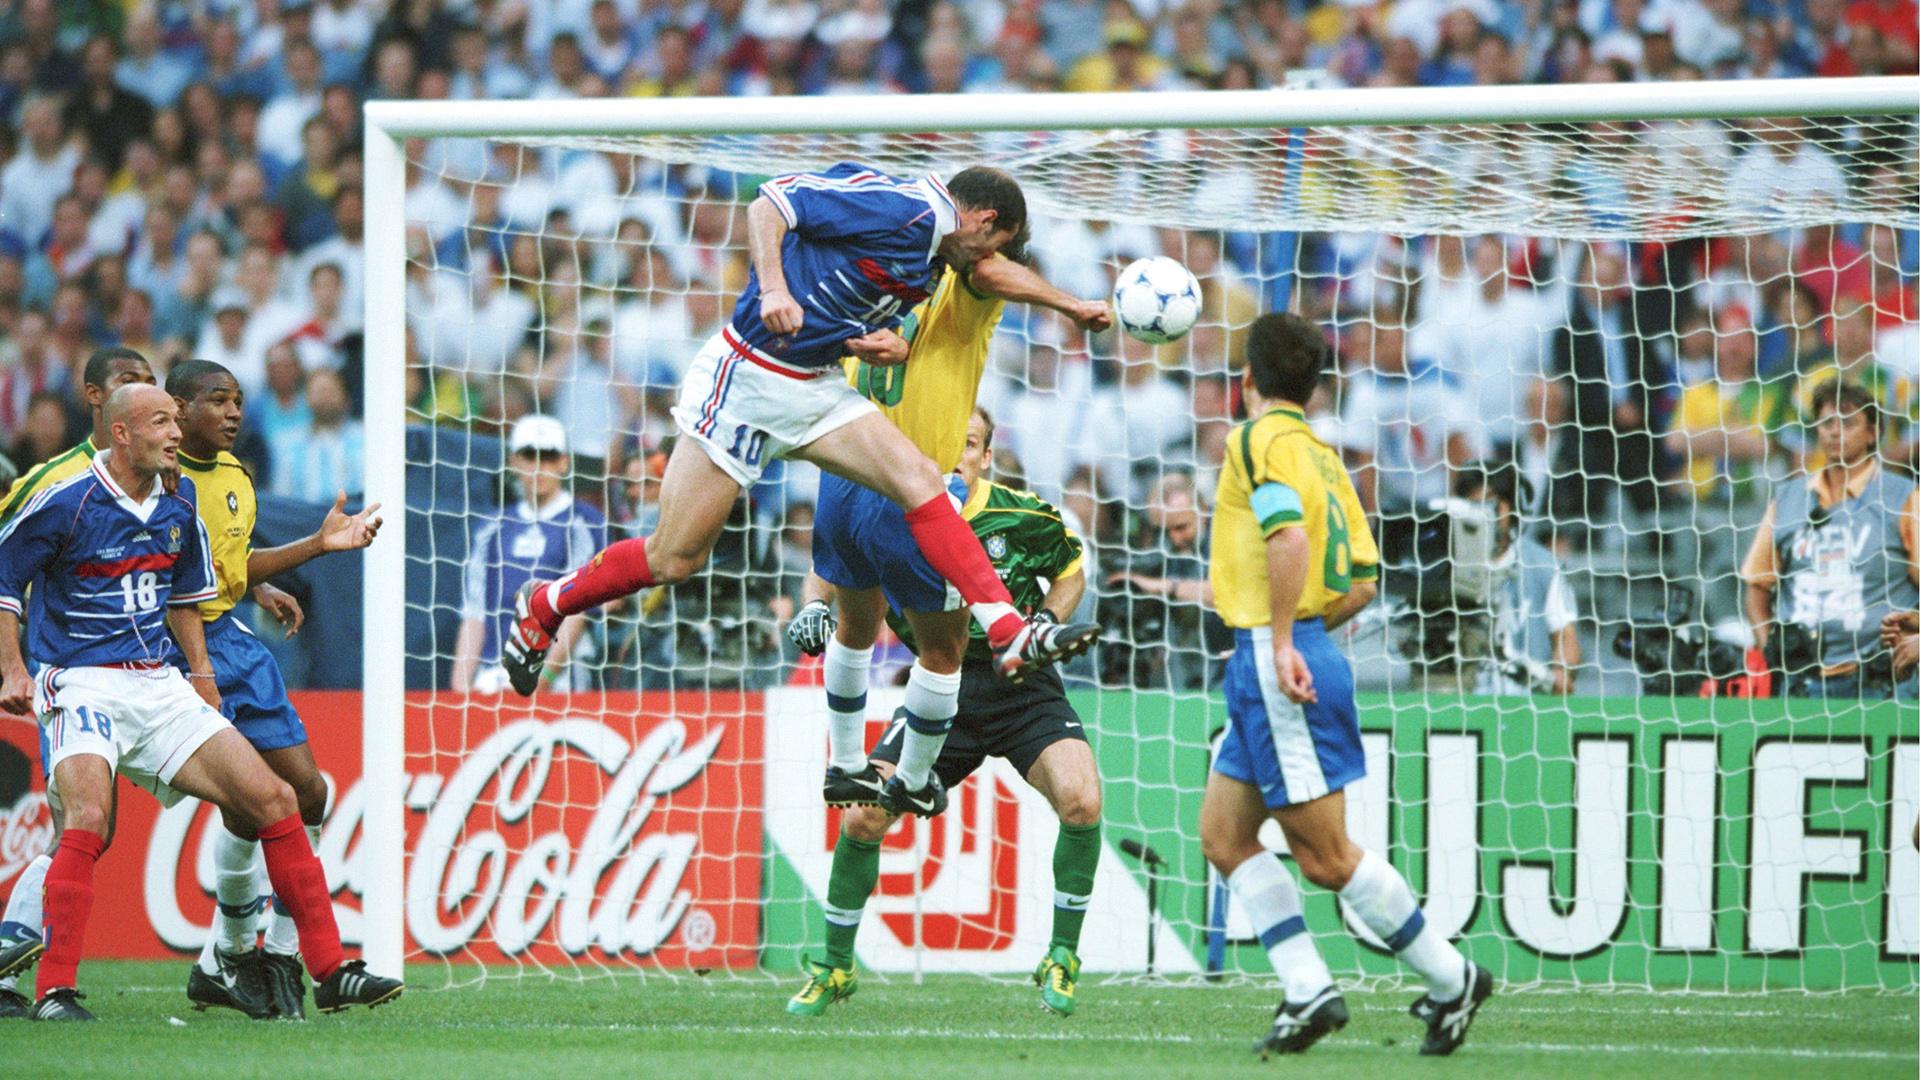 Francia '98, Platini: